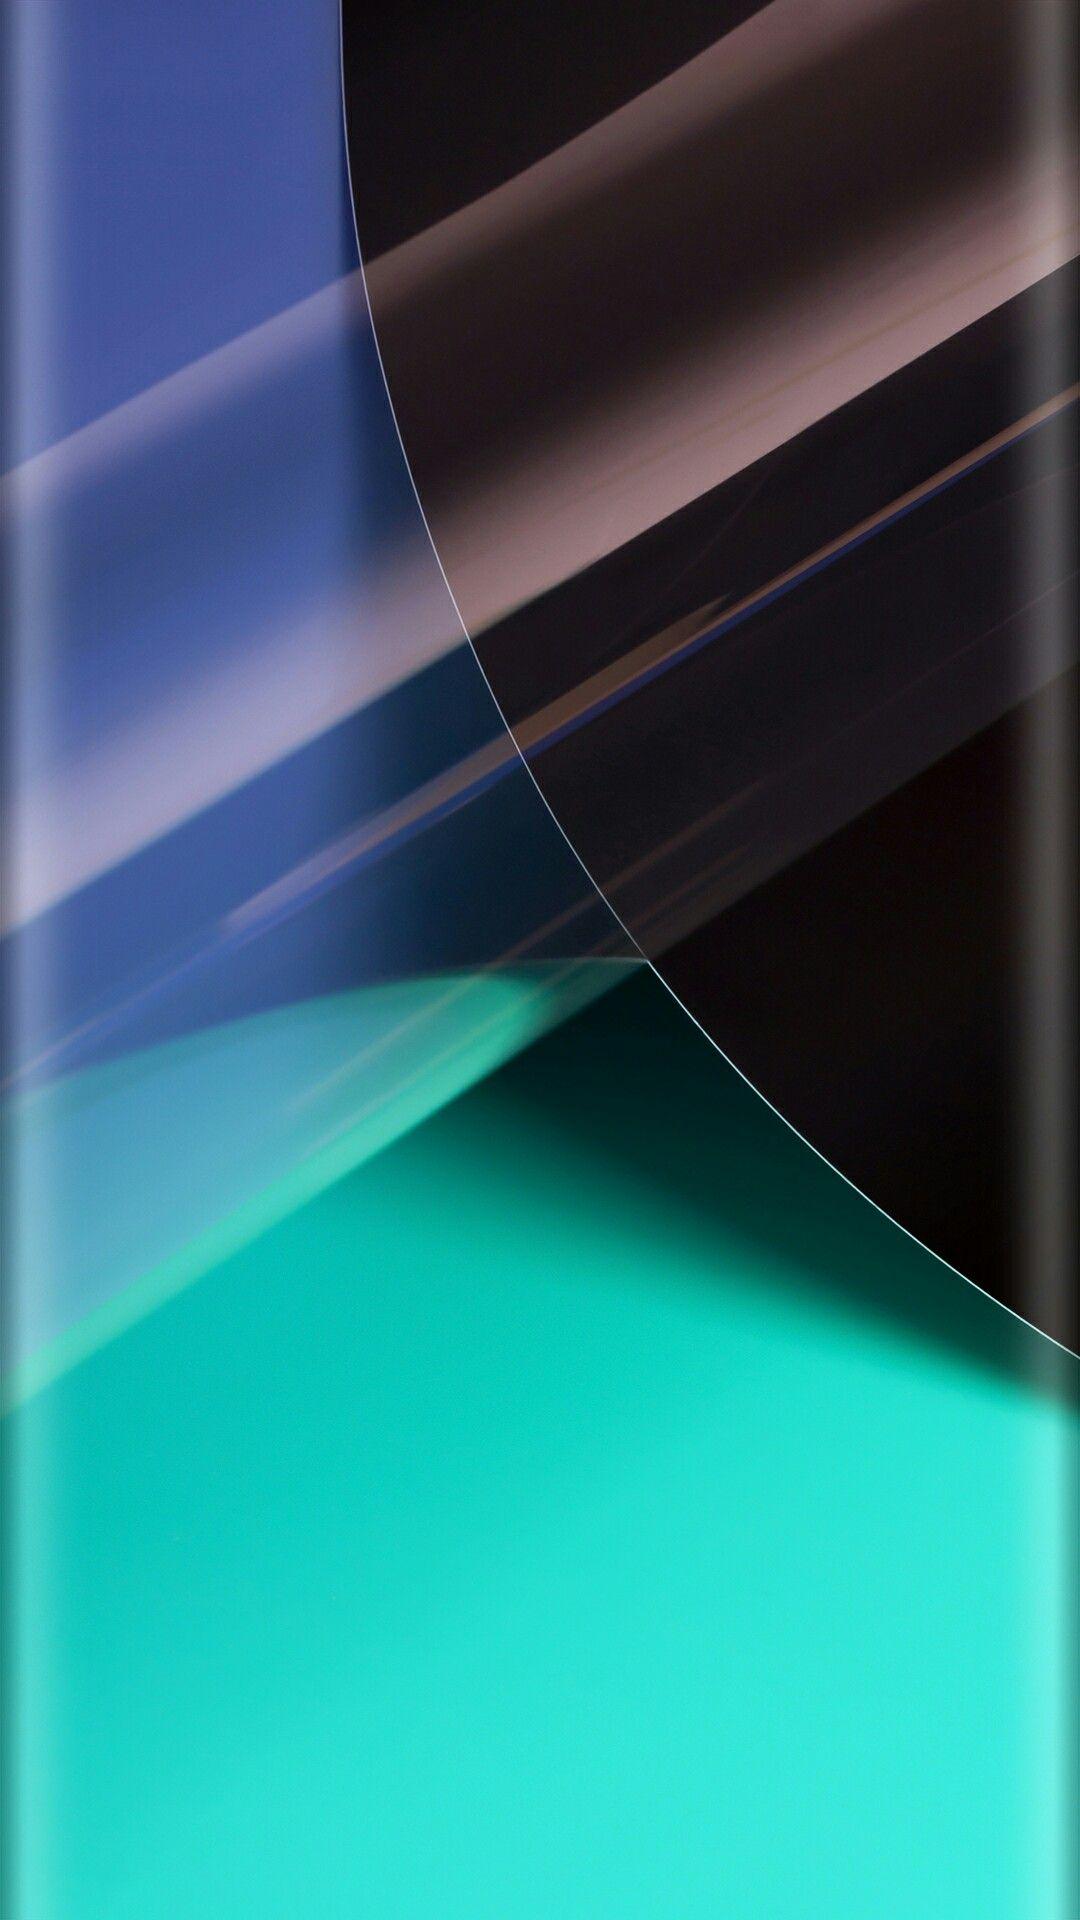 Samsung Iphone Edge Phone Telefon 3d Wallpaper Samsung Wallpaper Smartphone Wallpaper Hd Wallpaper